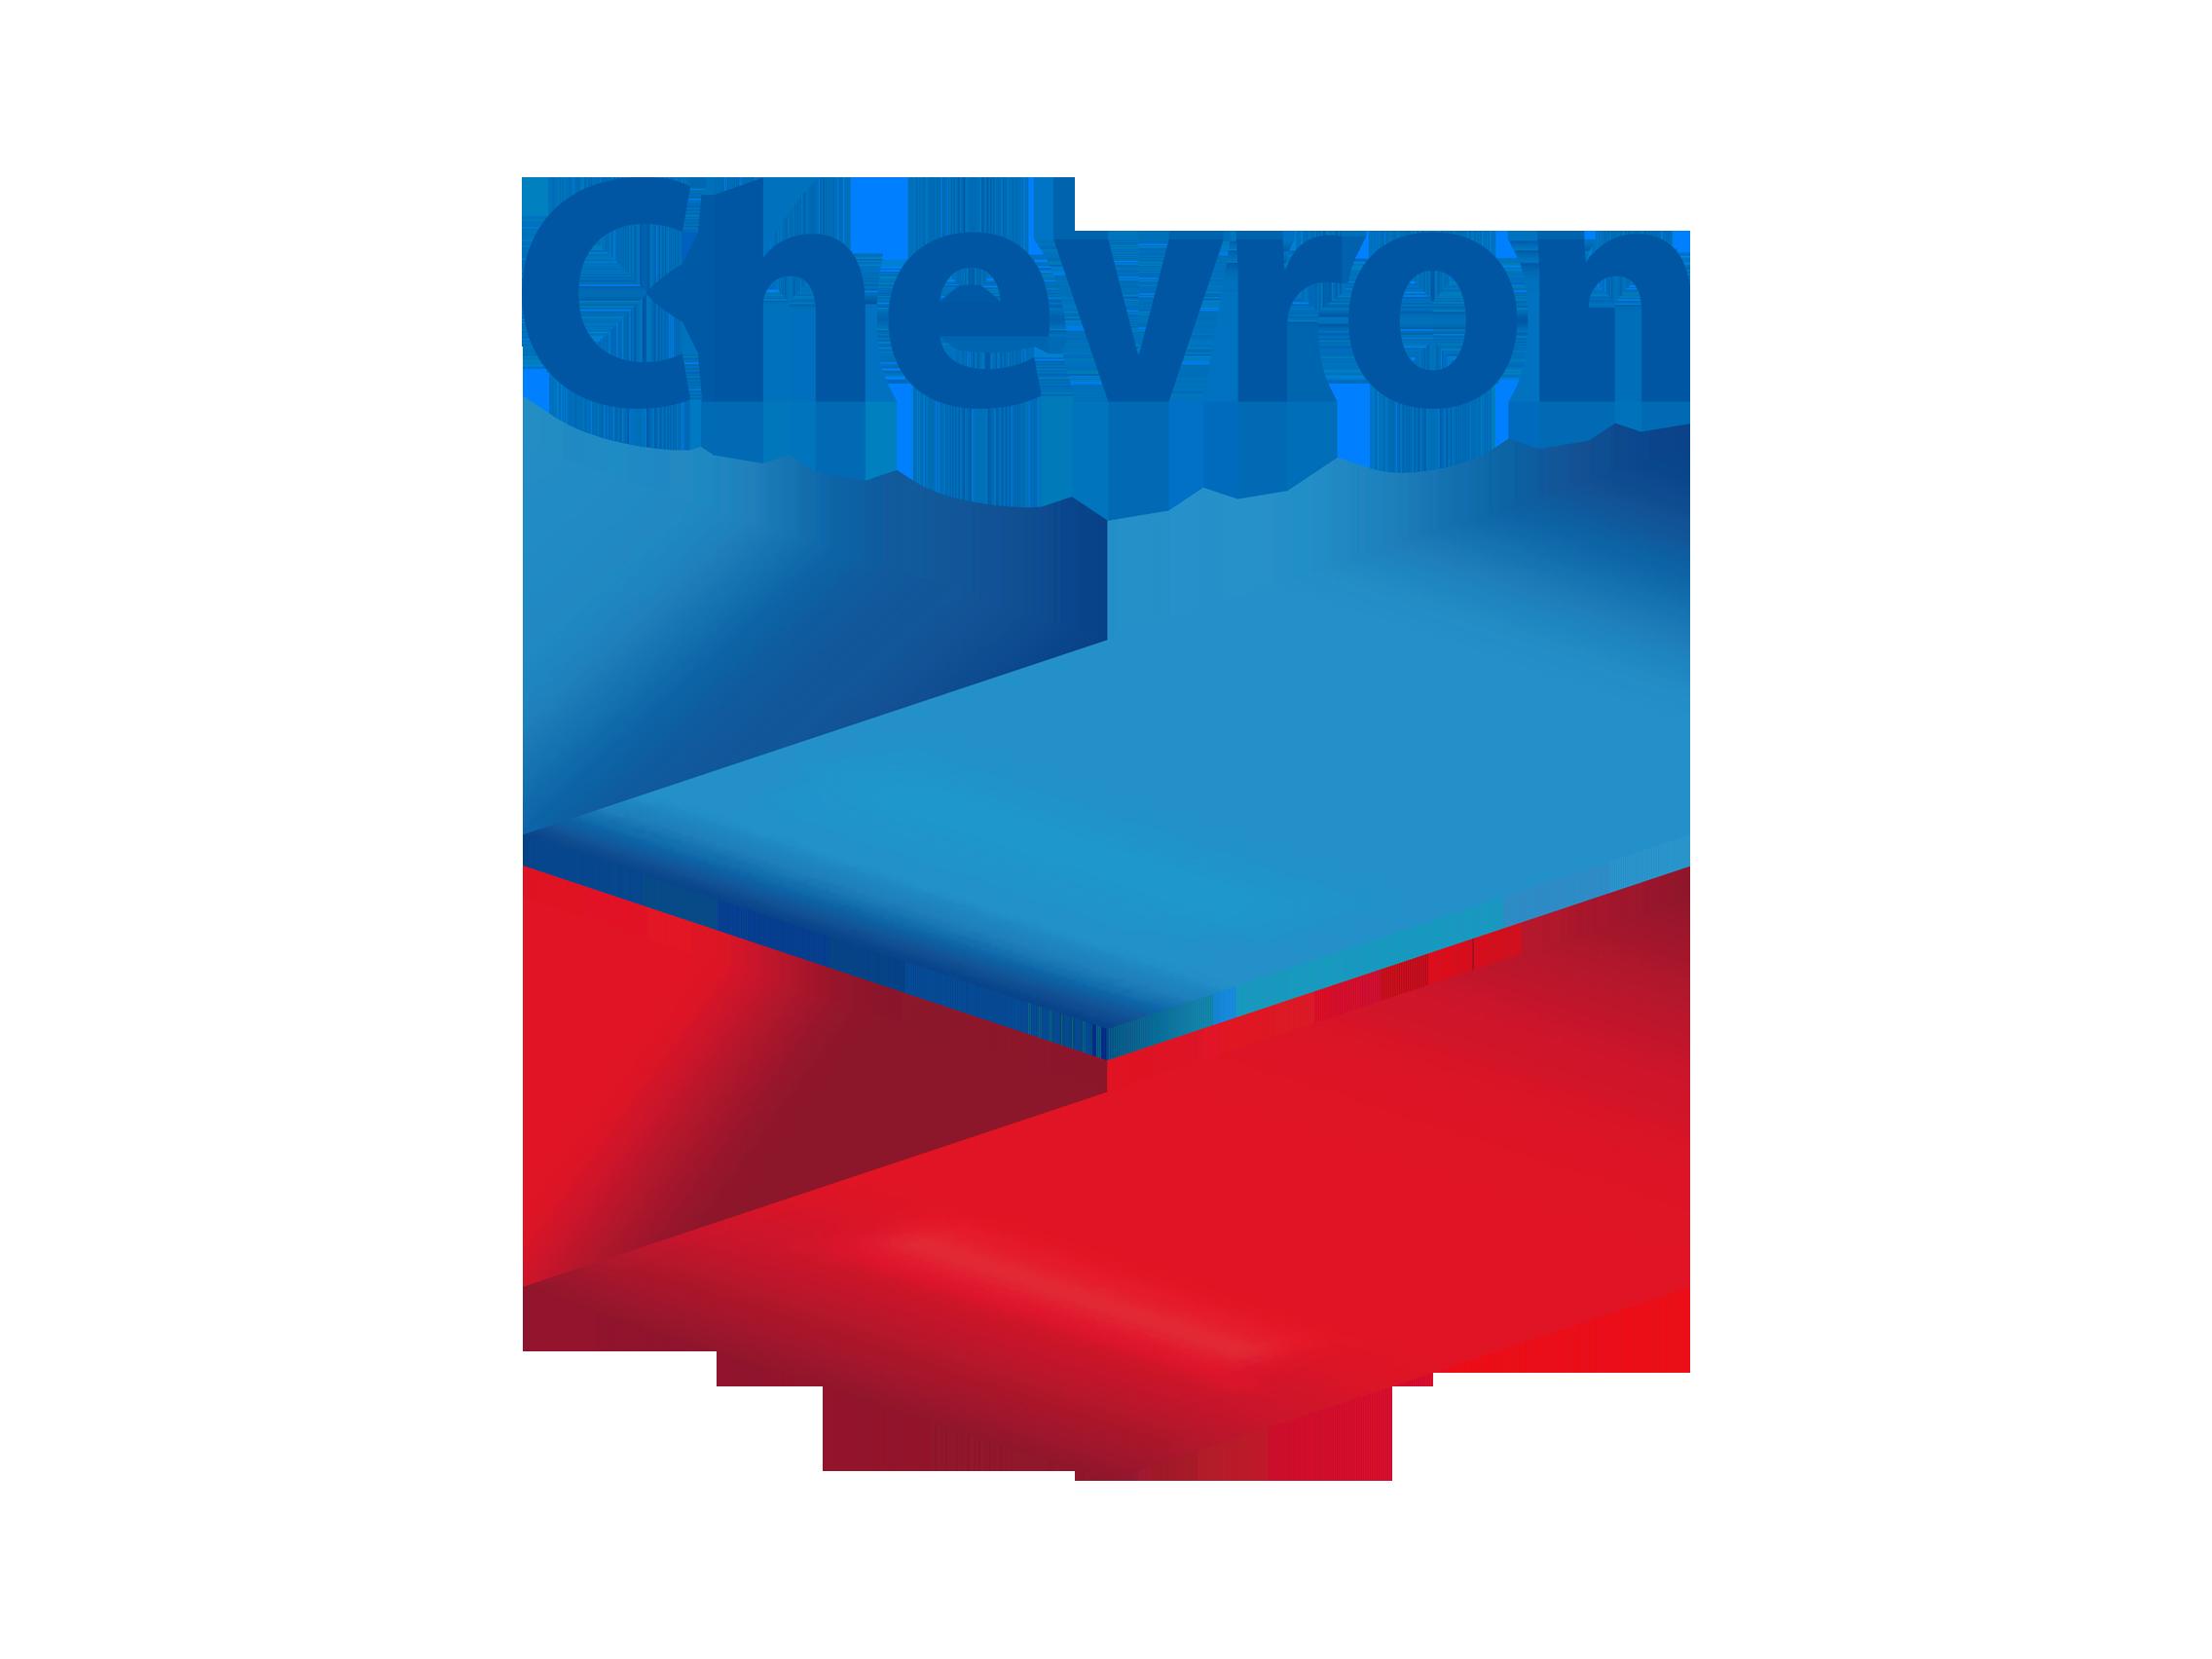 OPEX Customer - Chevron